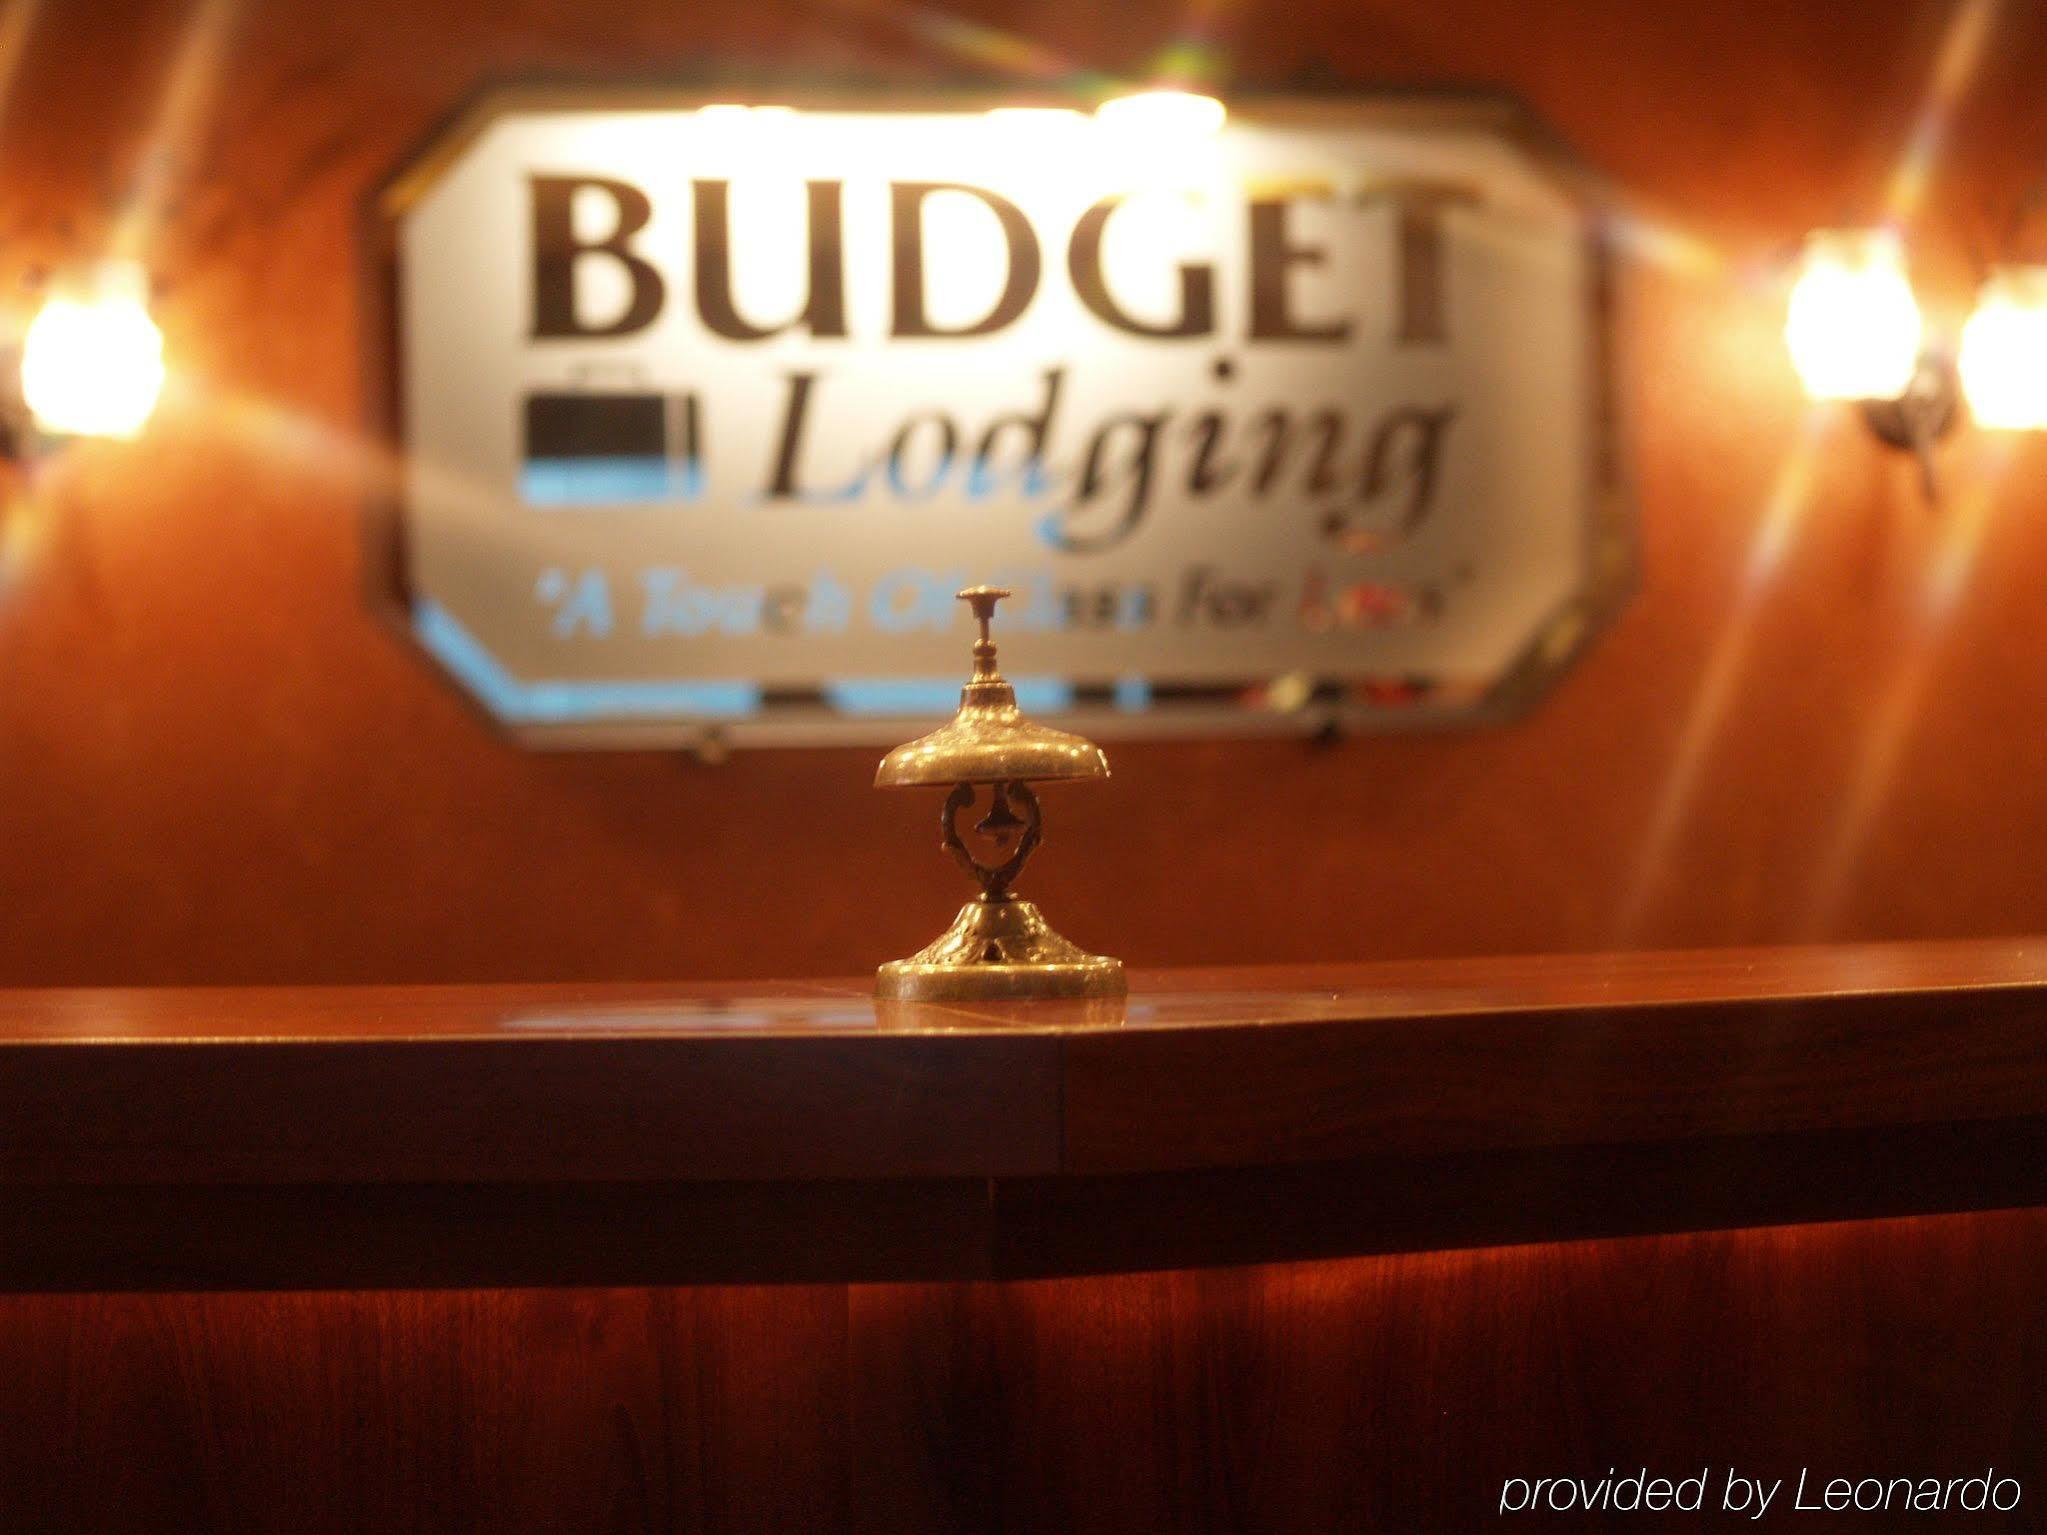 Budget Lodging